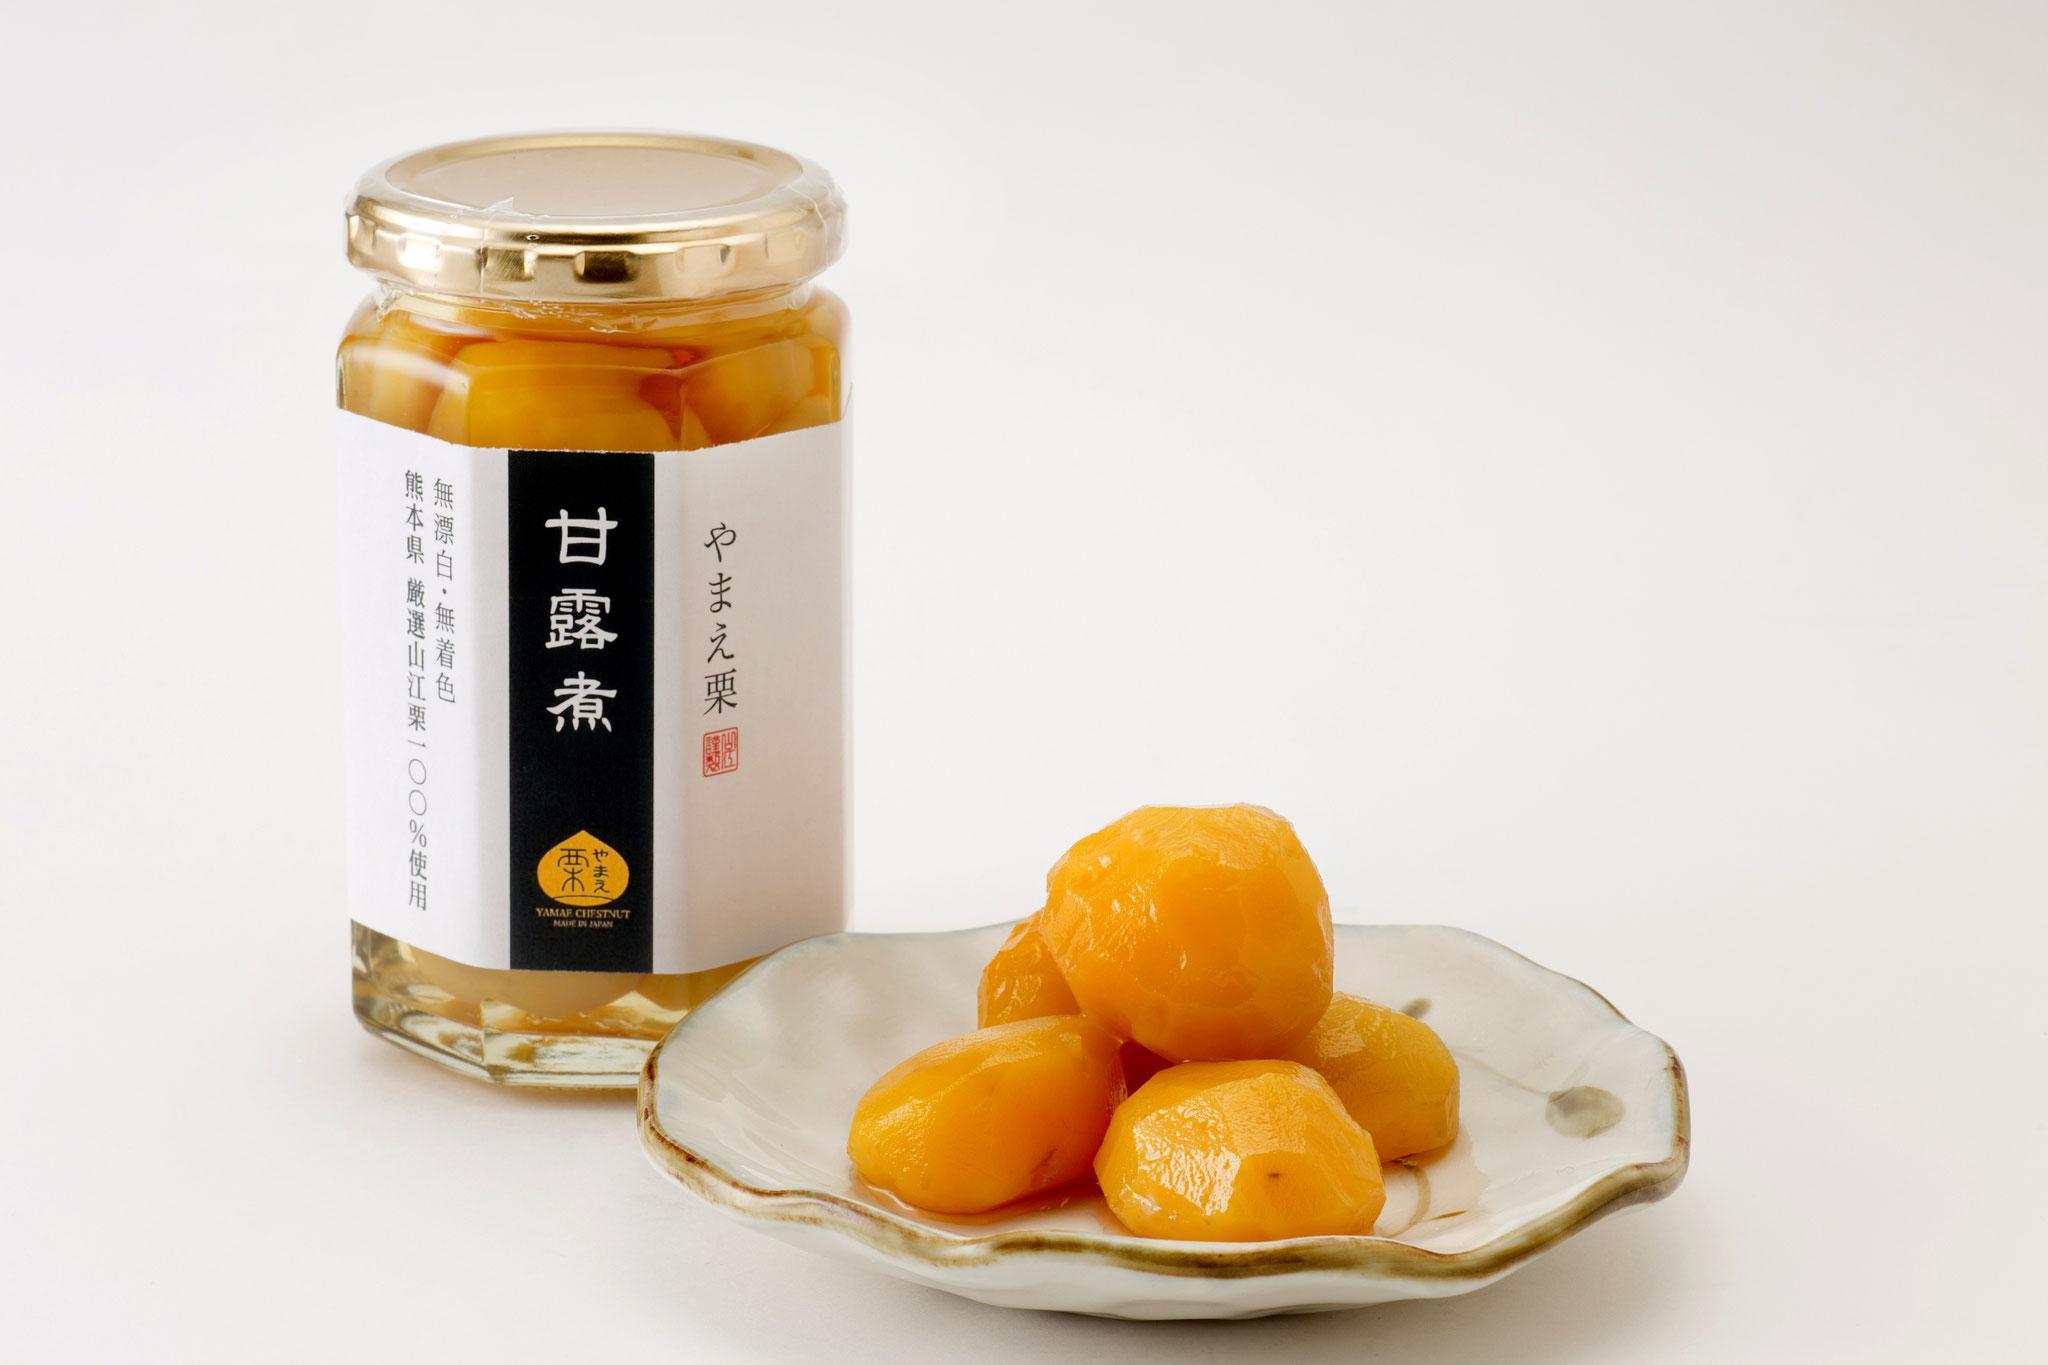 Kanro-ni (marron cuit aux sucres)